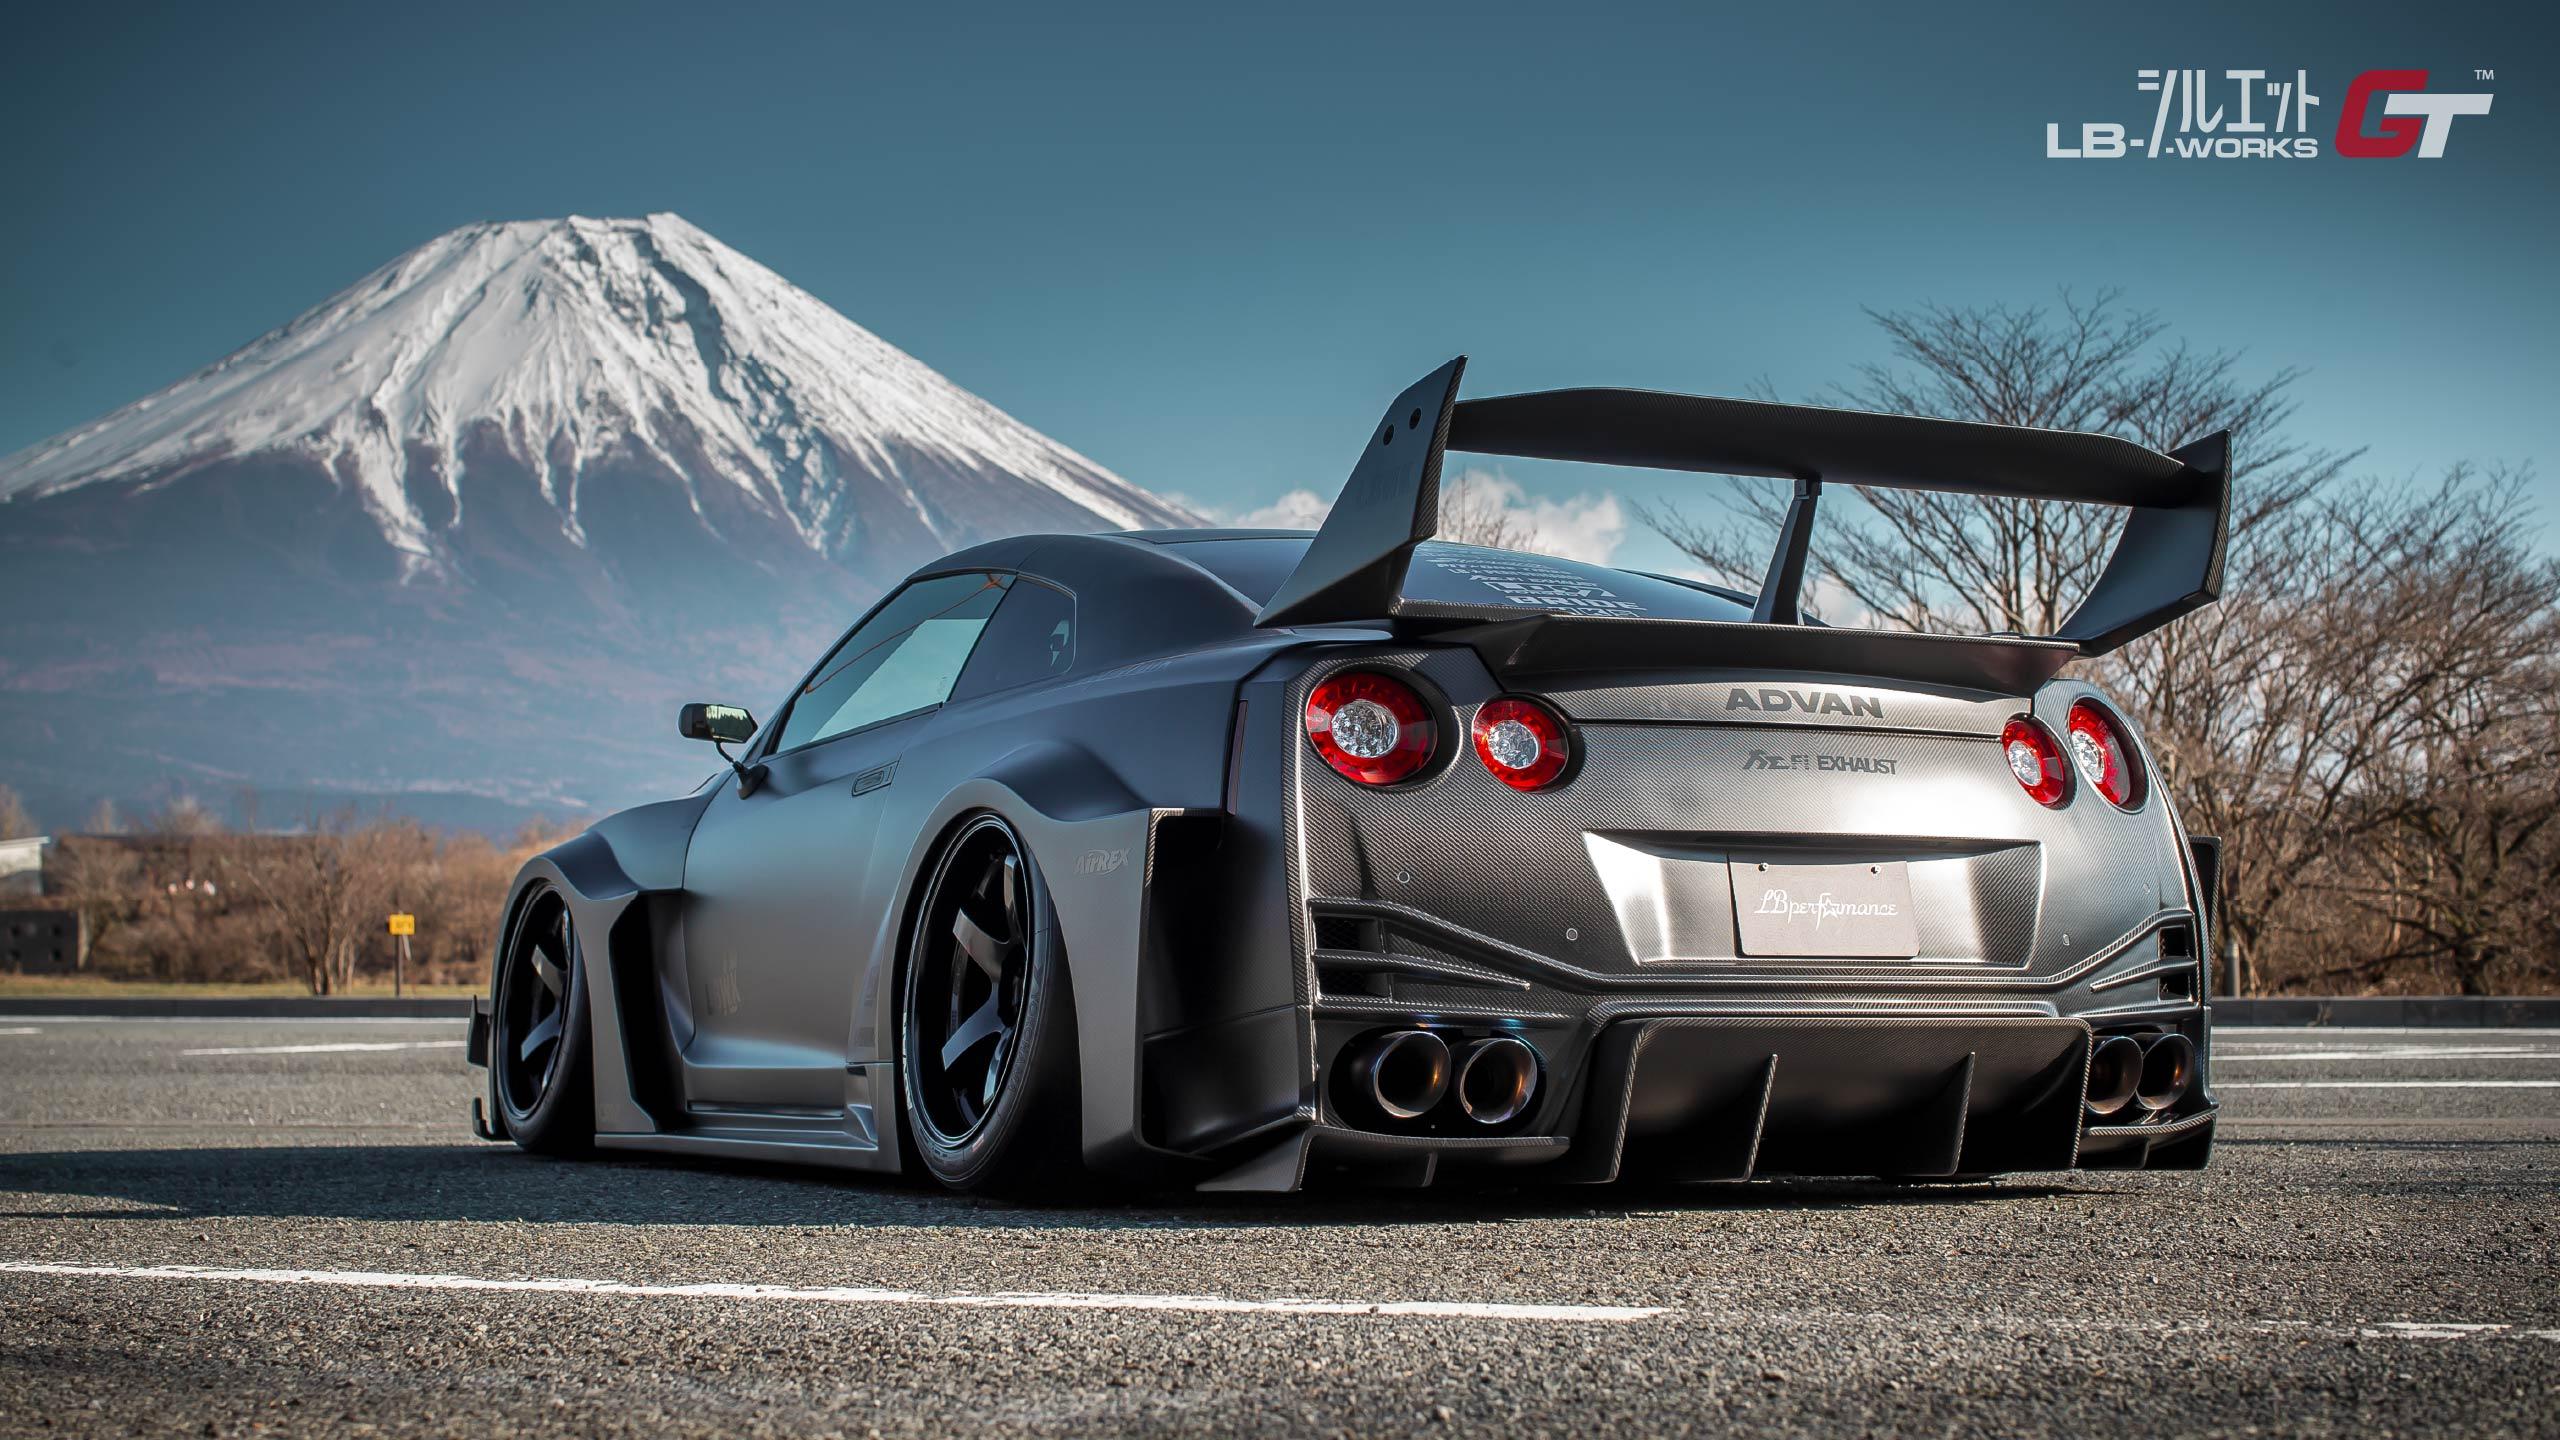 Liberty-Walk-Nissan-GT-R-Super-Silhouette-4